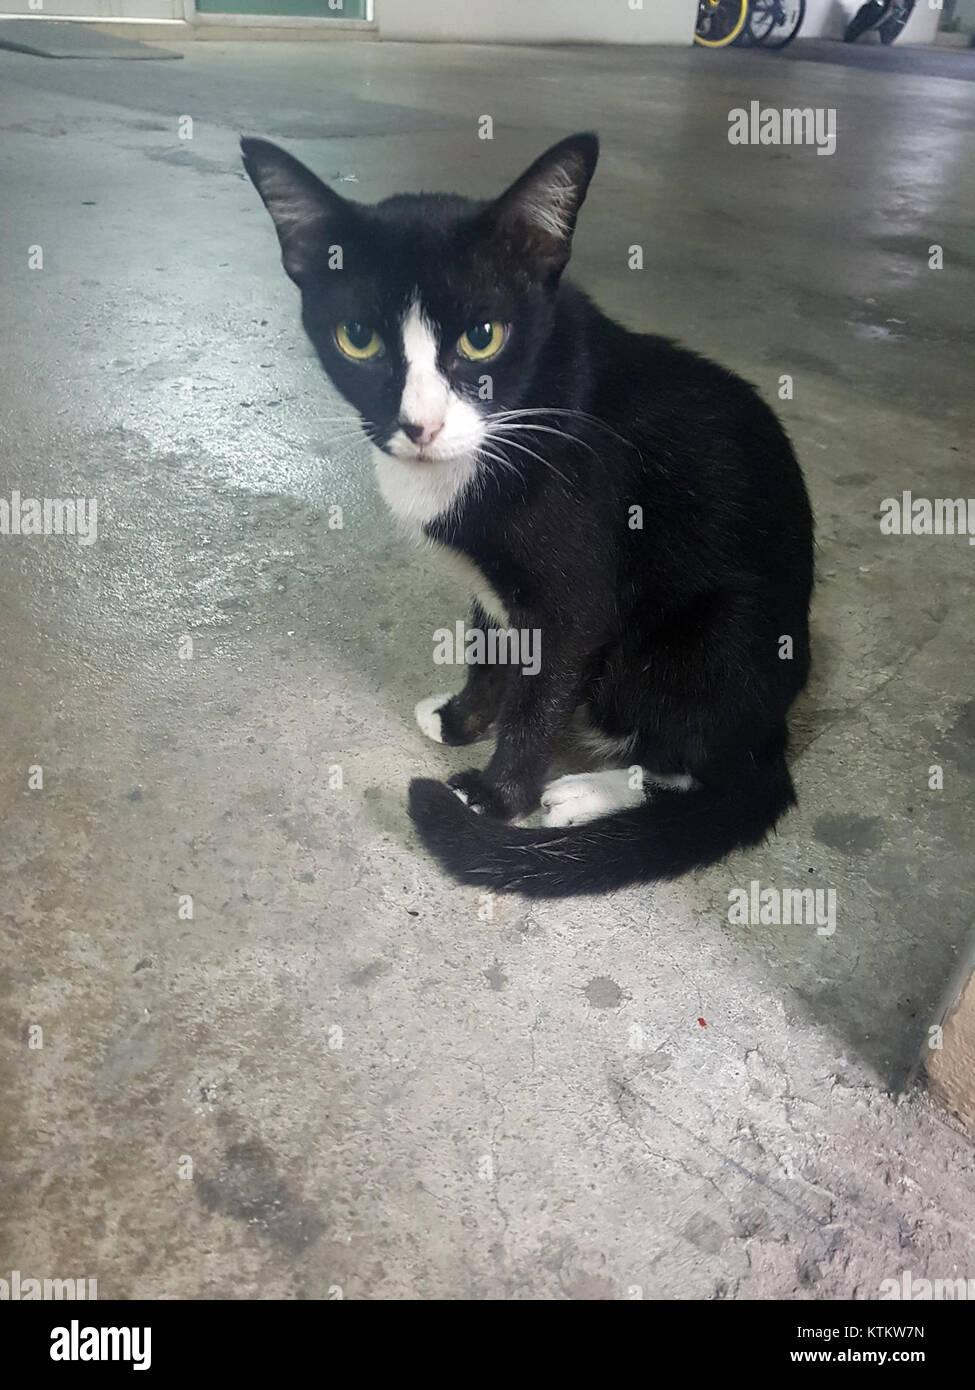 Bangkok kitty   2017 05 13 (001) - Stock Image